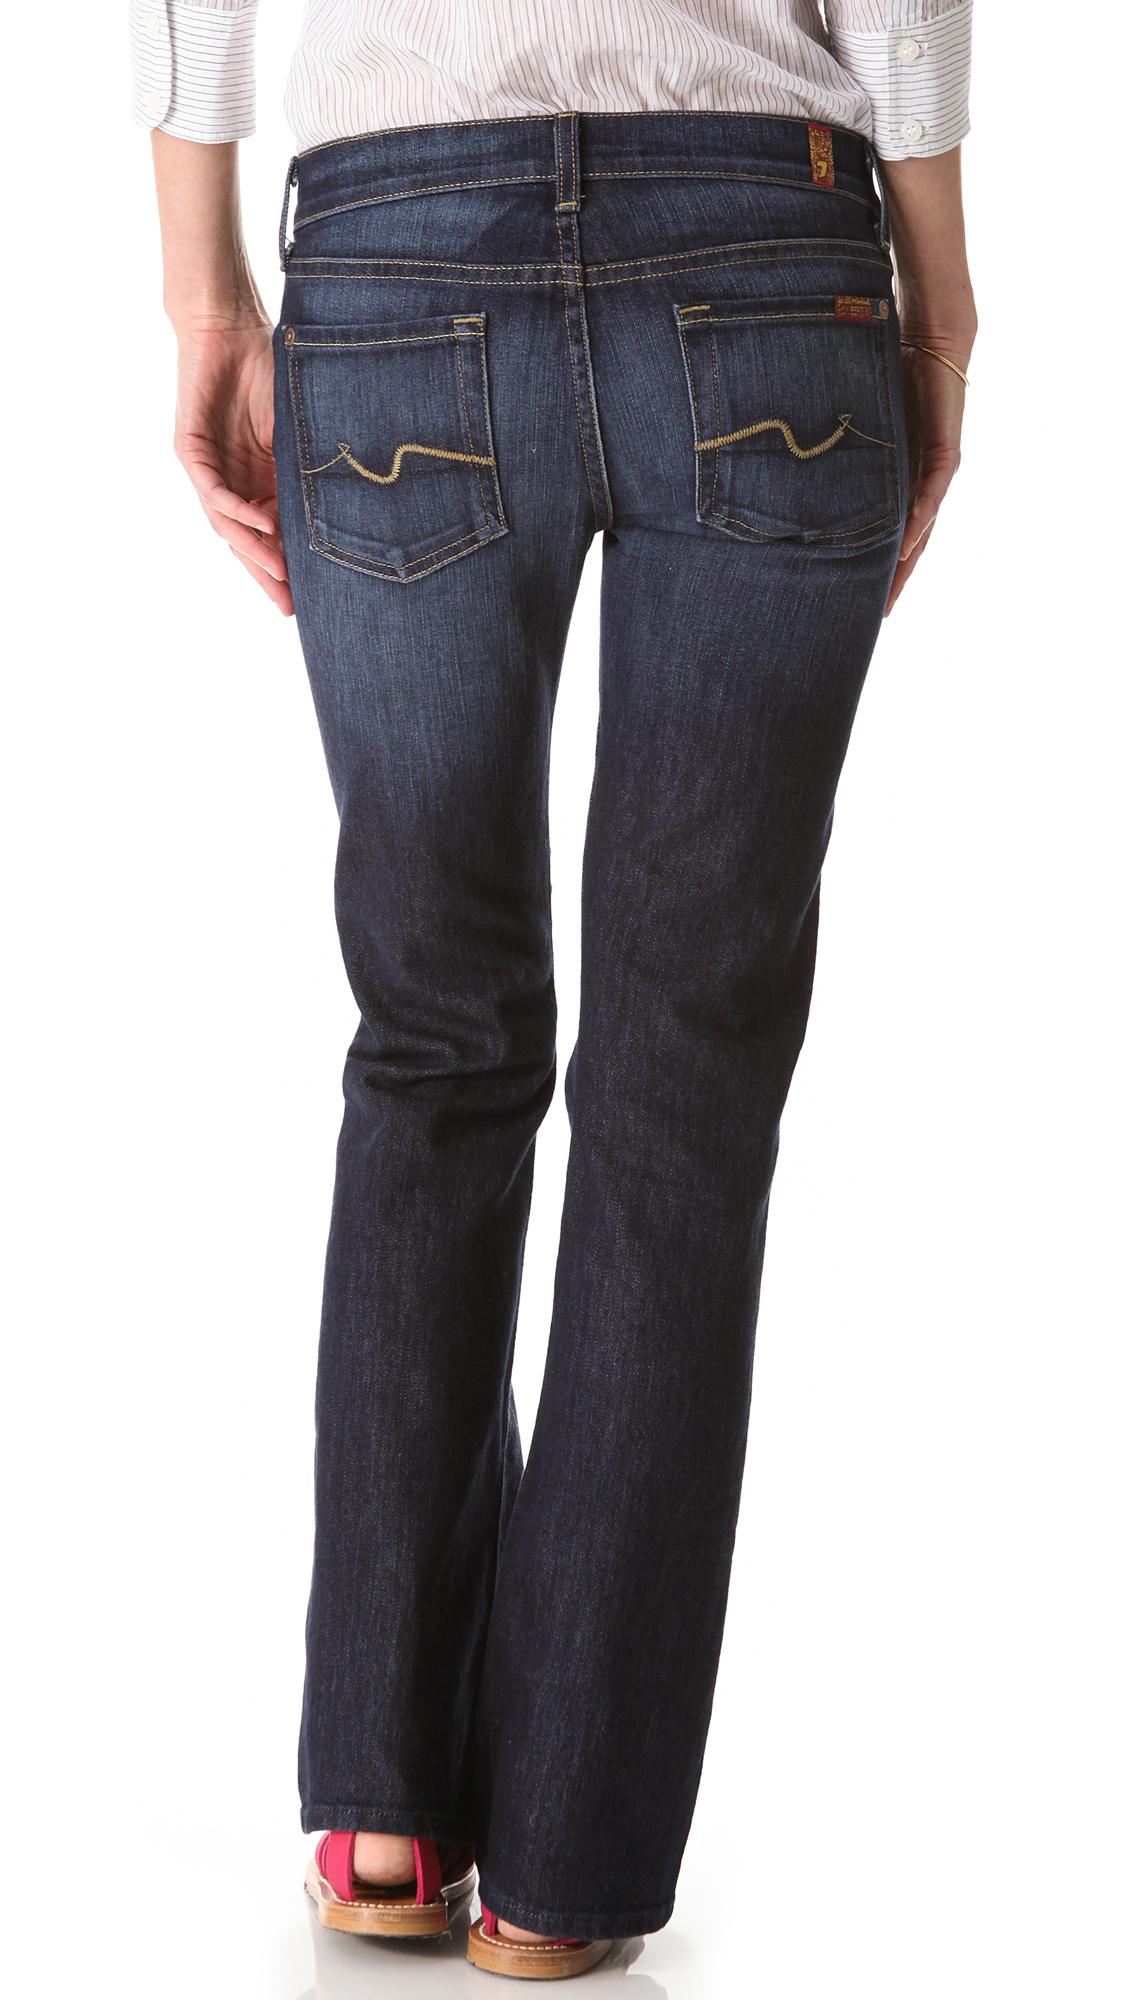 Joes Jeans Womens